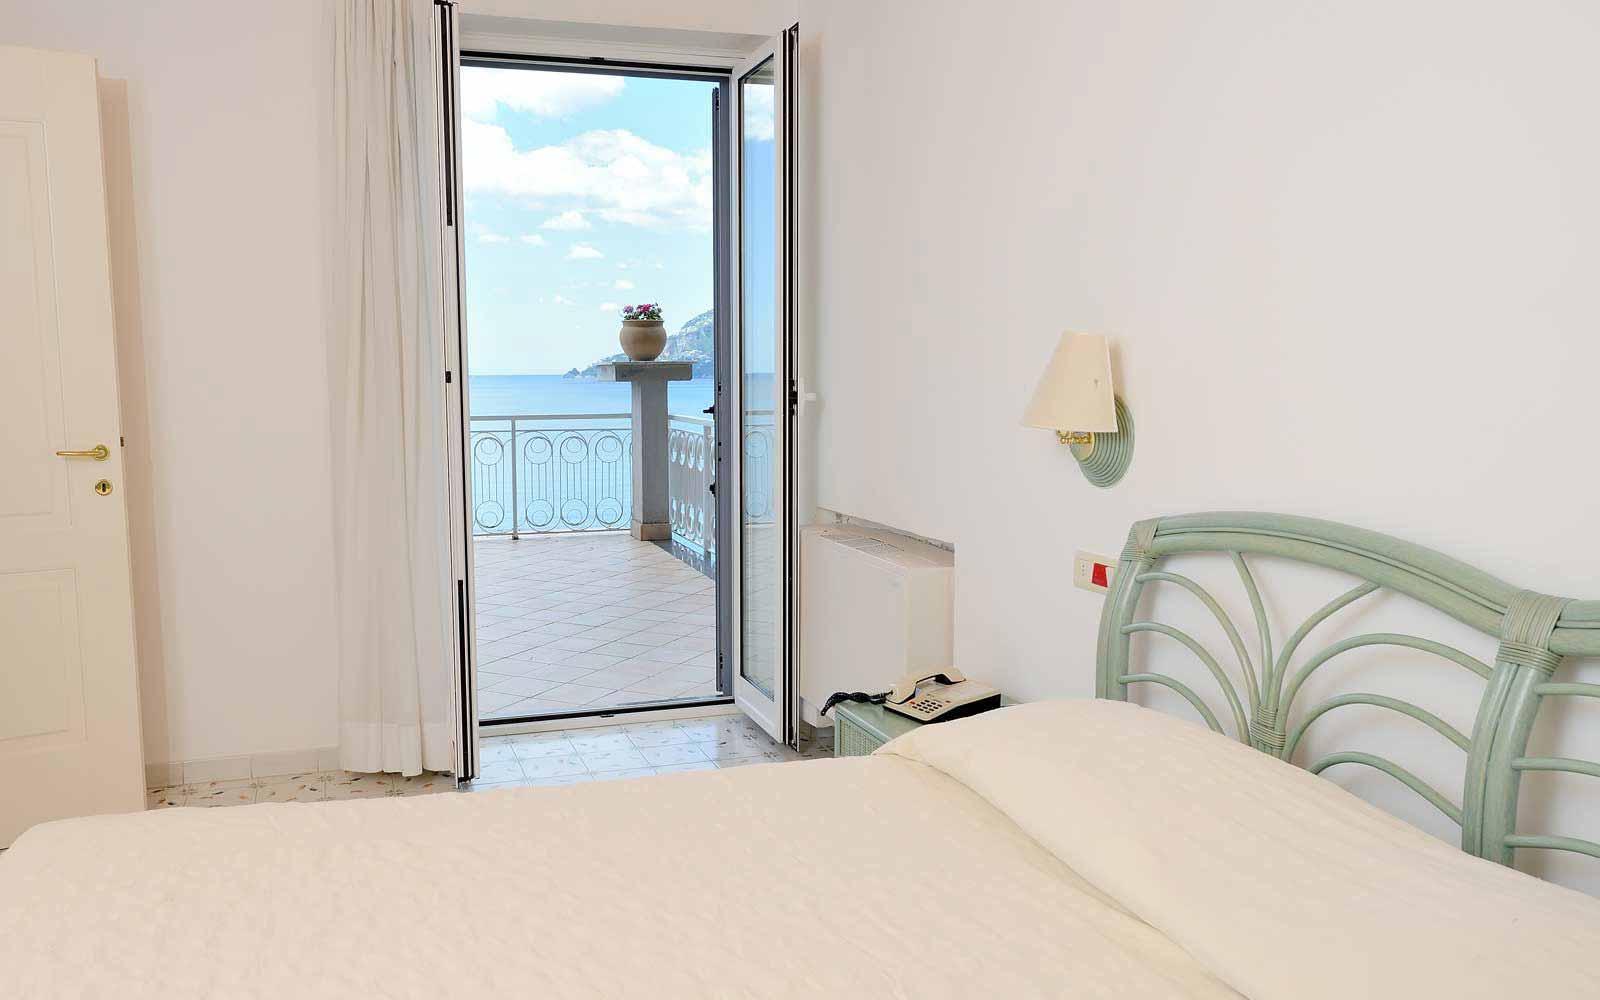 Panoramic balcony sea view room at Hotel Club Due Torri